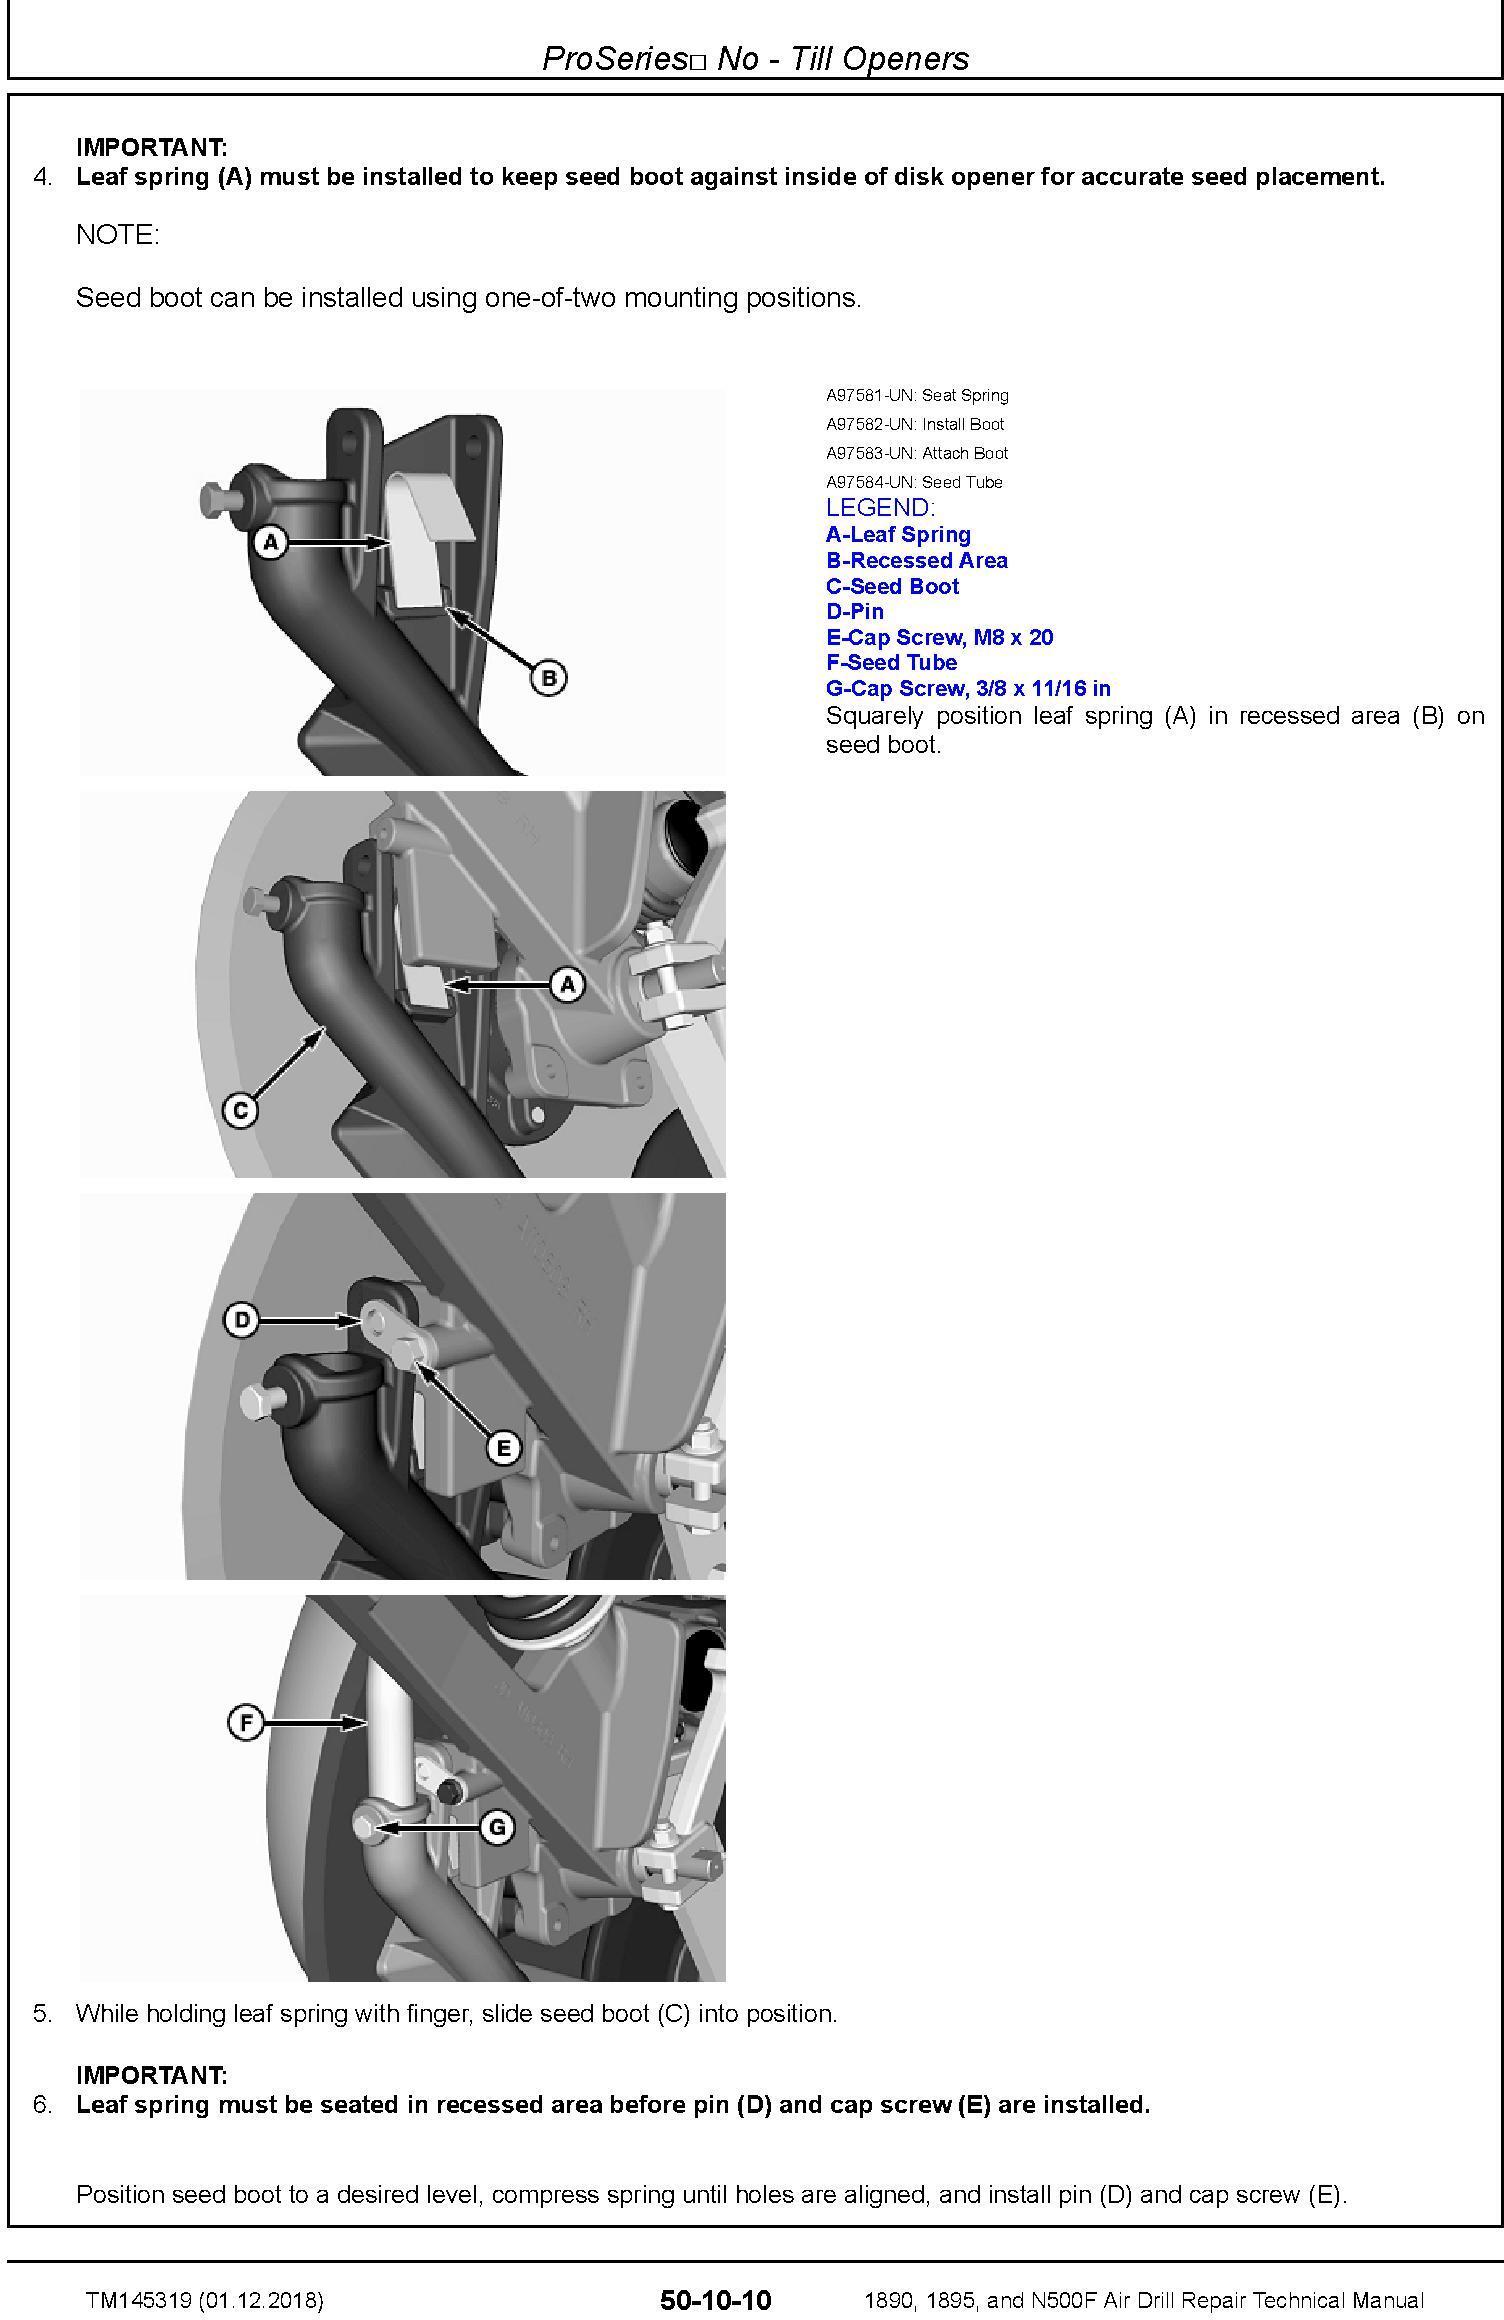 JD John Deere 1890, 1895, N500F Air Drill (SN.775101-) Repair Technical Service Manual (TM145319) - 3